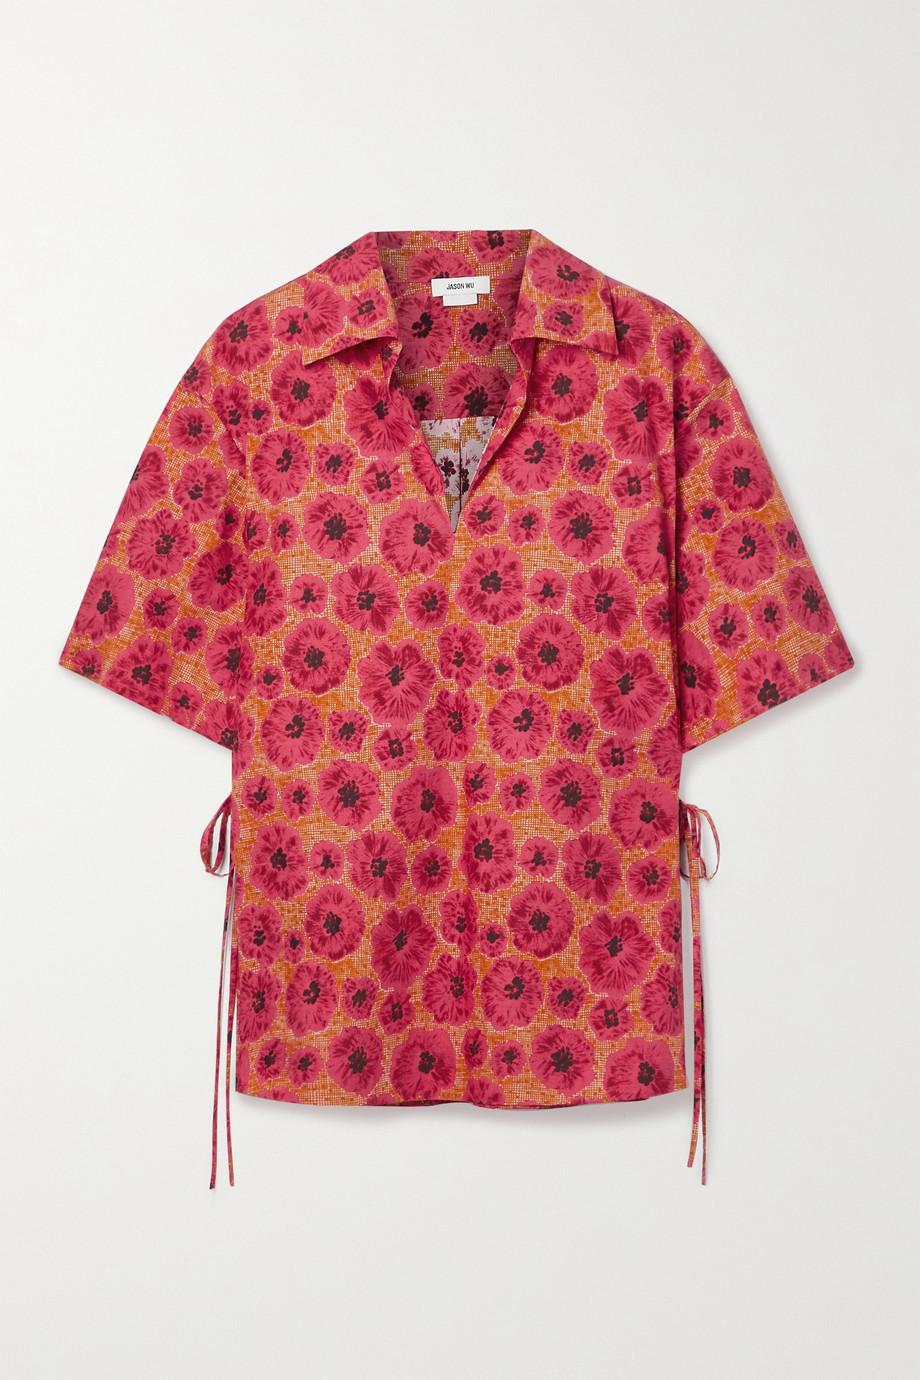 Jason Wu Tie-detailed floral-print cotton-poplin top